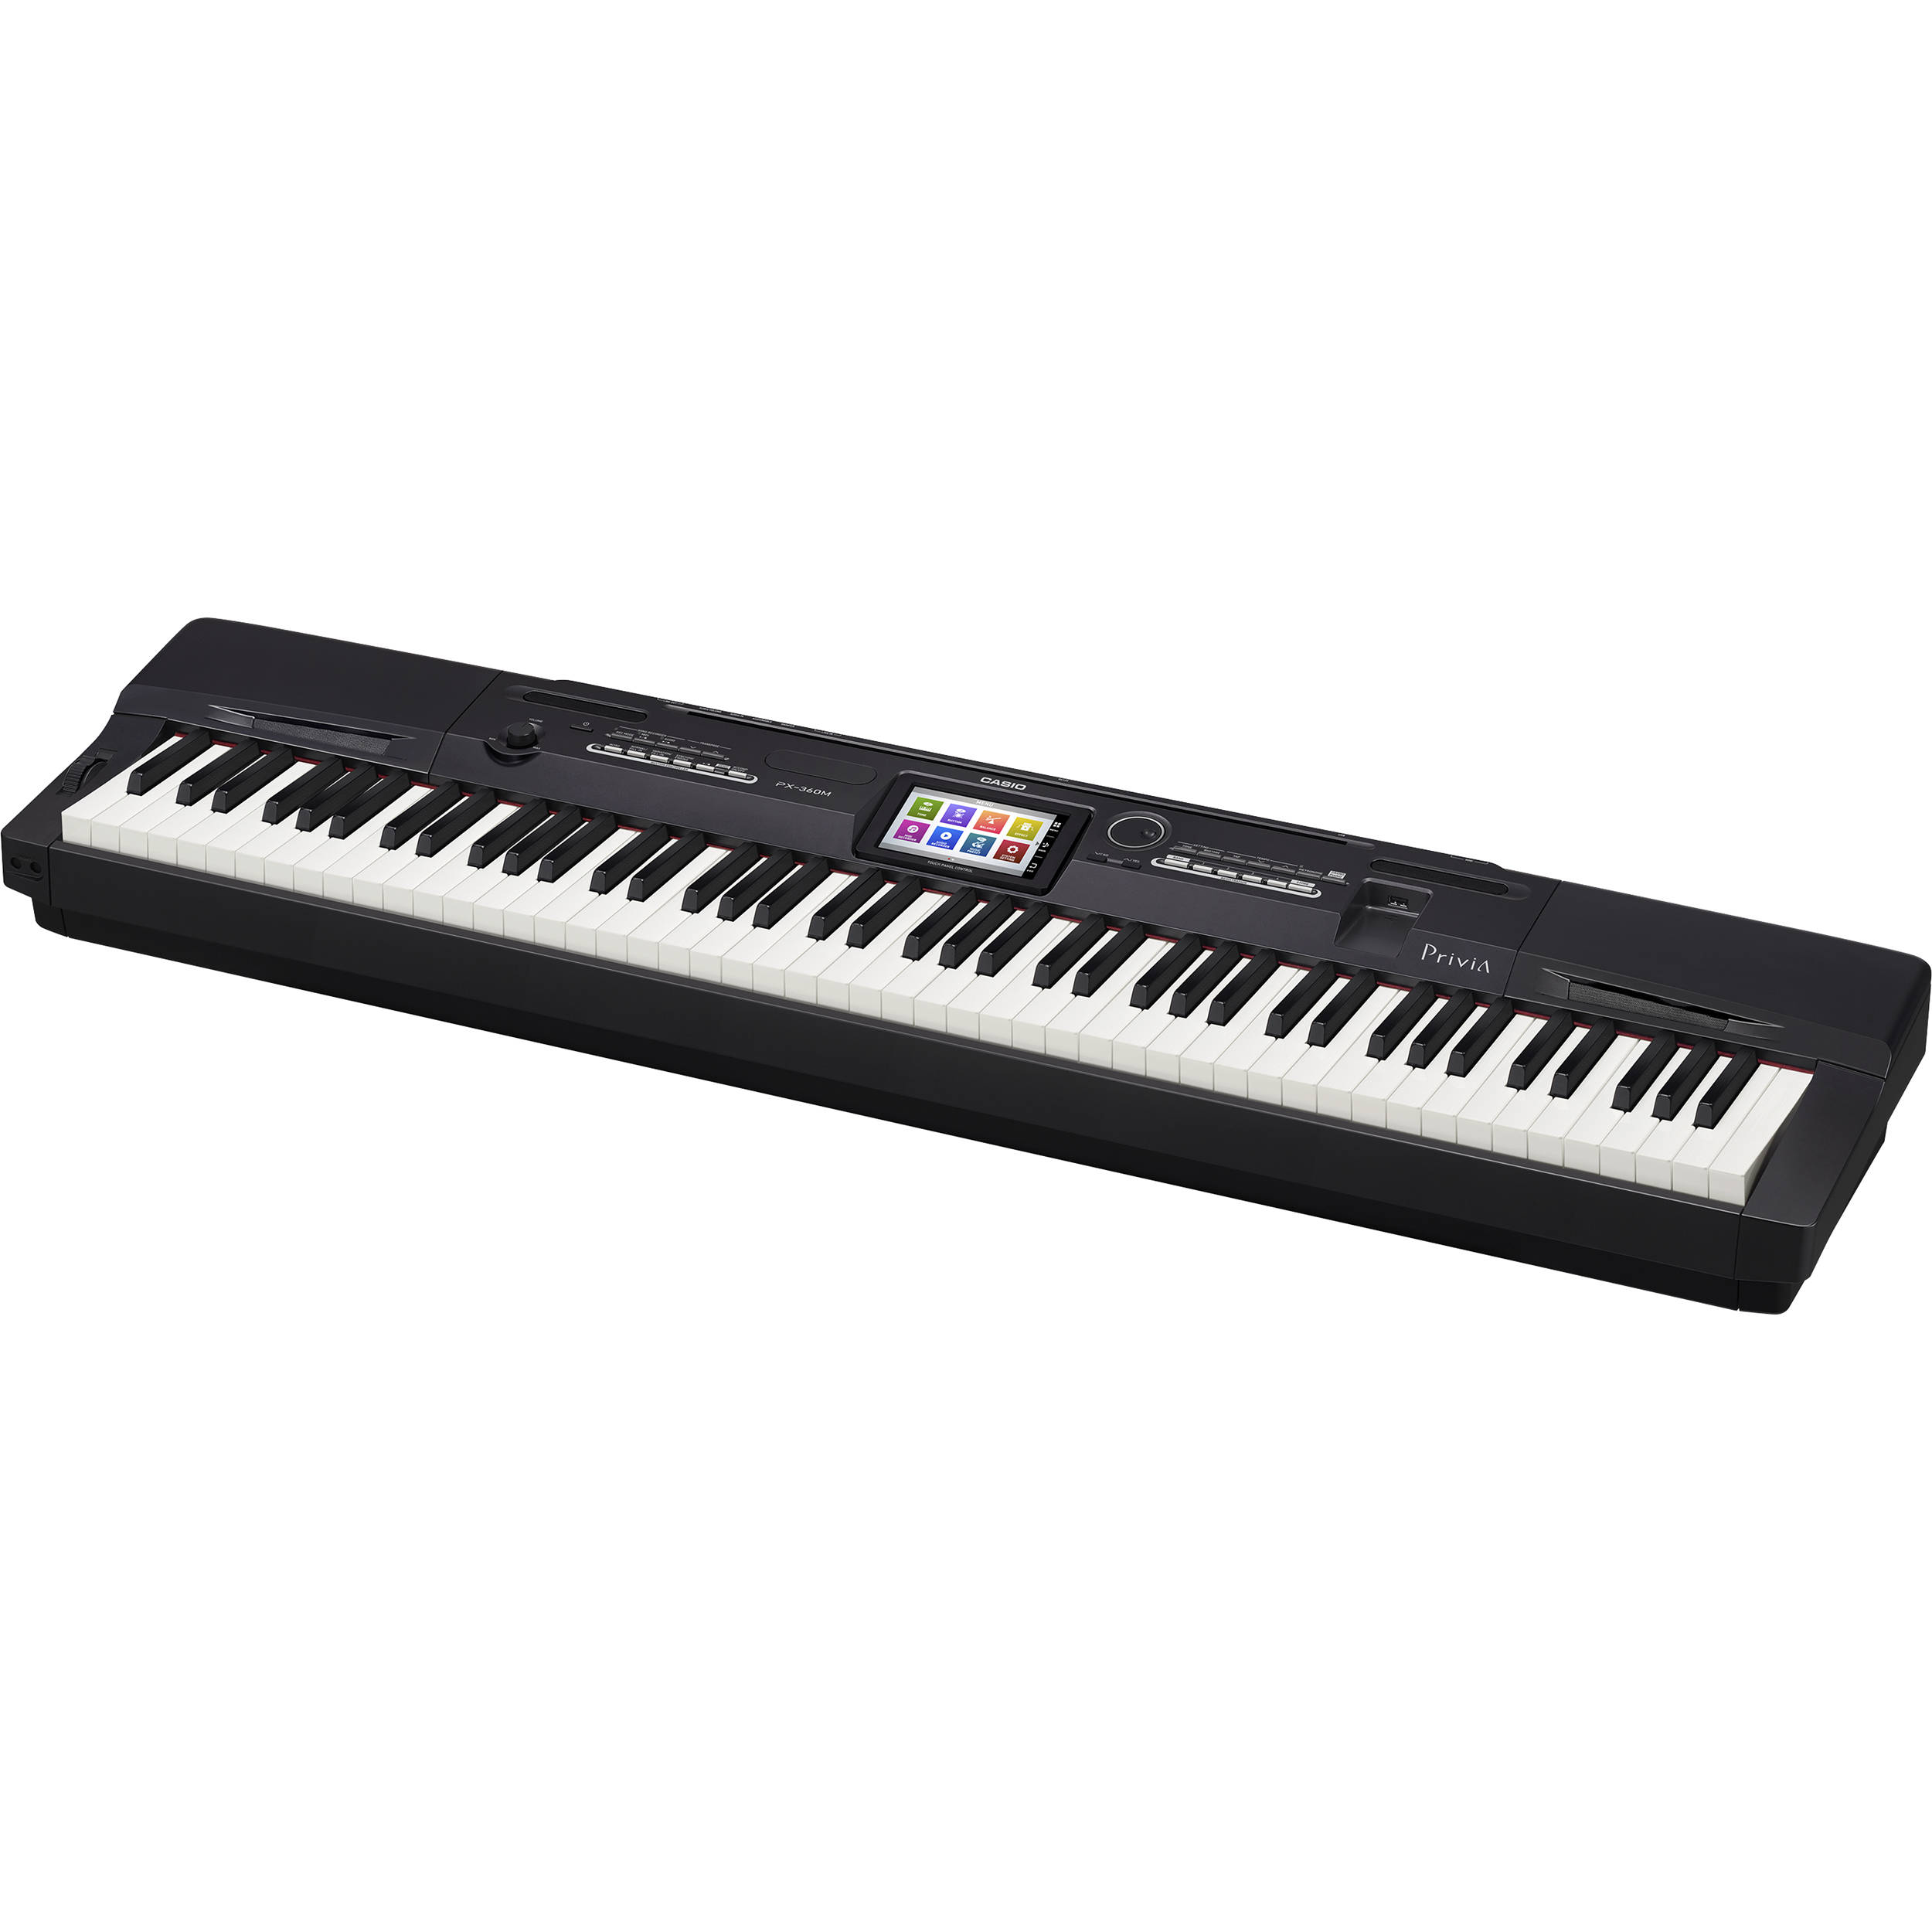 enter keyboards